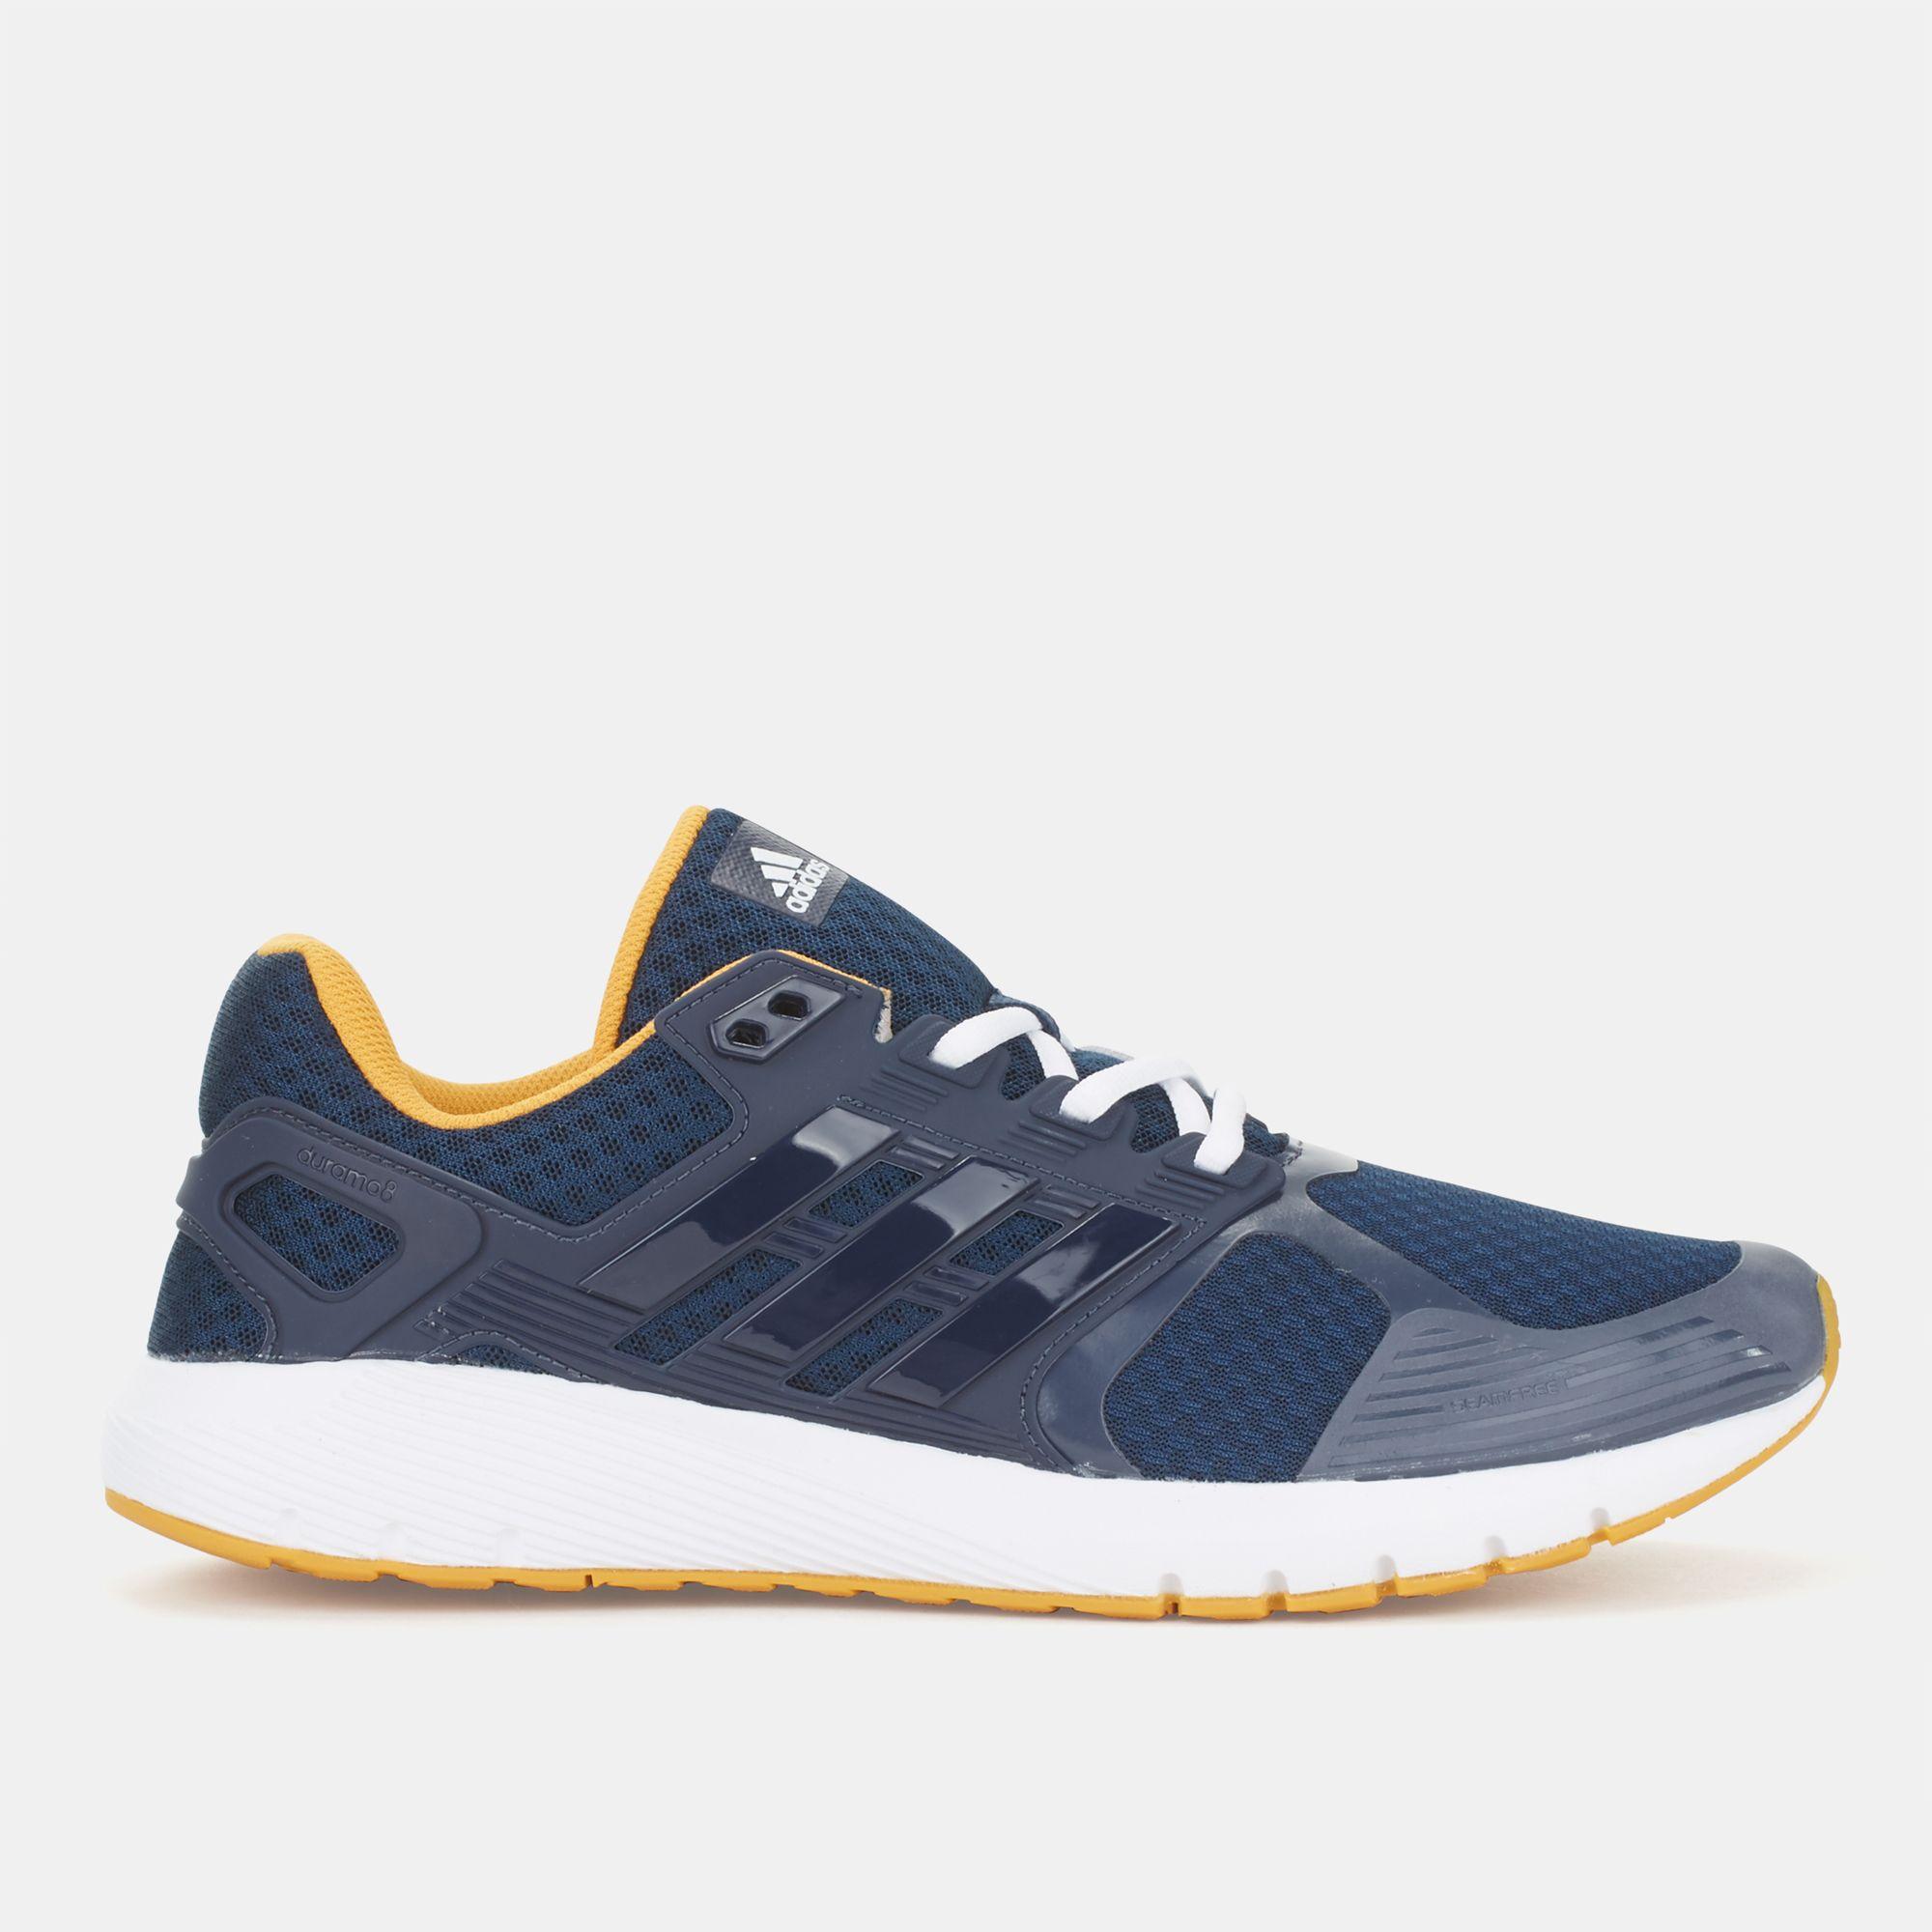 Shop Blue adidas adidas Duramo 8 M Shoe for Mens by adidas adidas 1 SSS 01d397